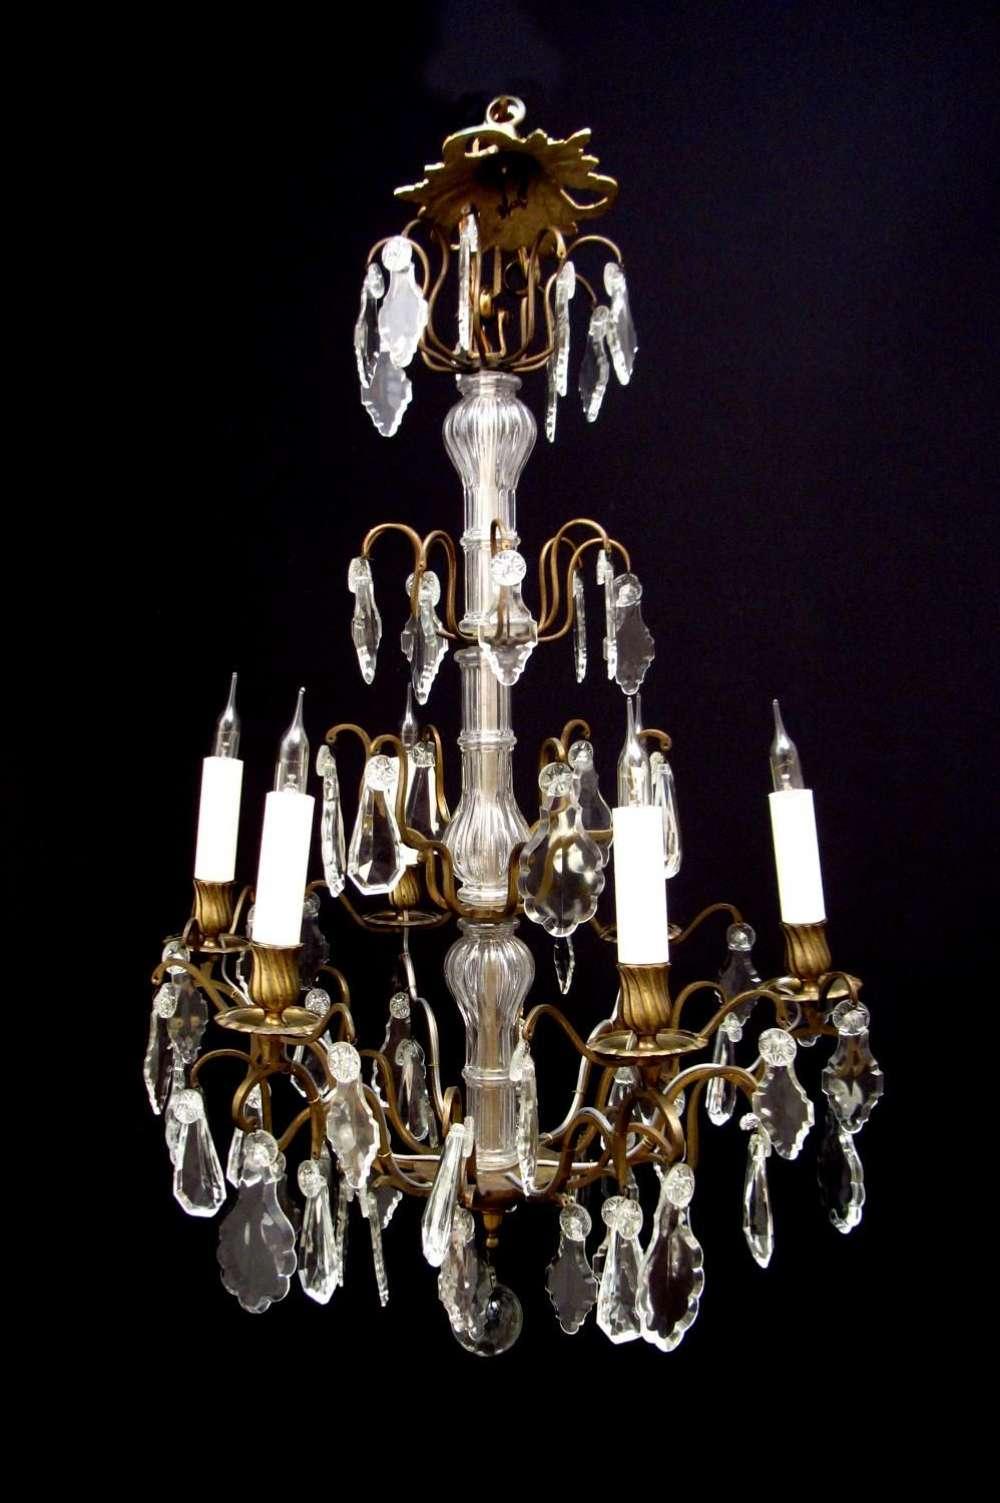 A GEORGE II CUT GLASS EIGHT LIGHT CHANDELIER | CIRCA 1750